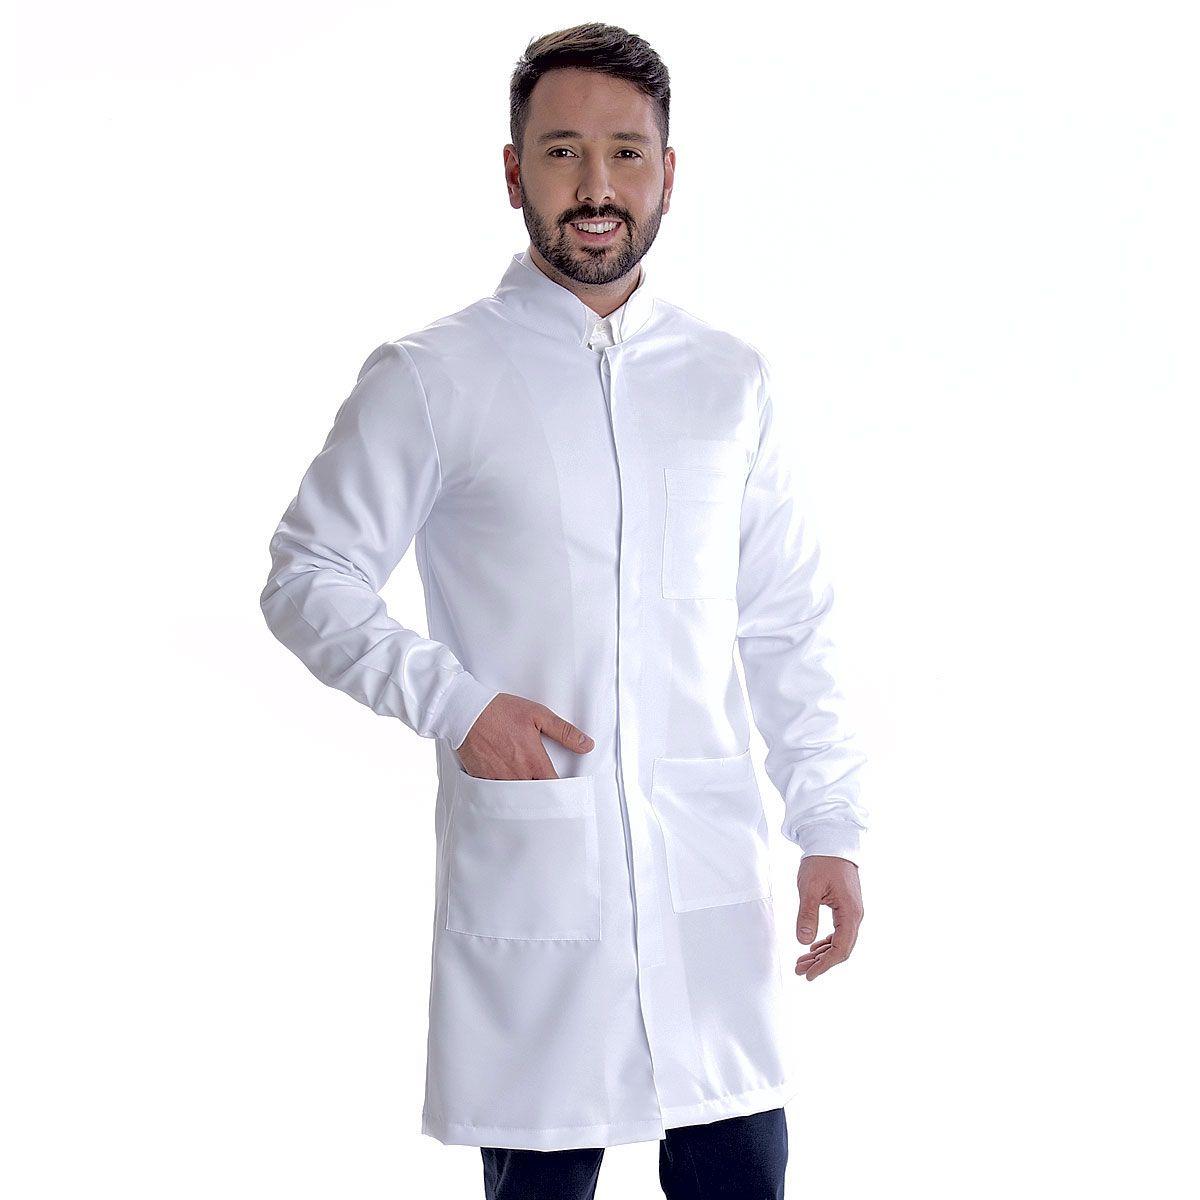 Jaleco Masculino Unik FunWork